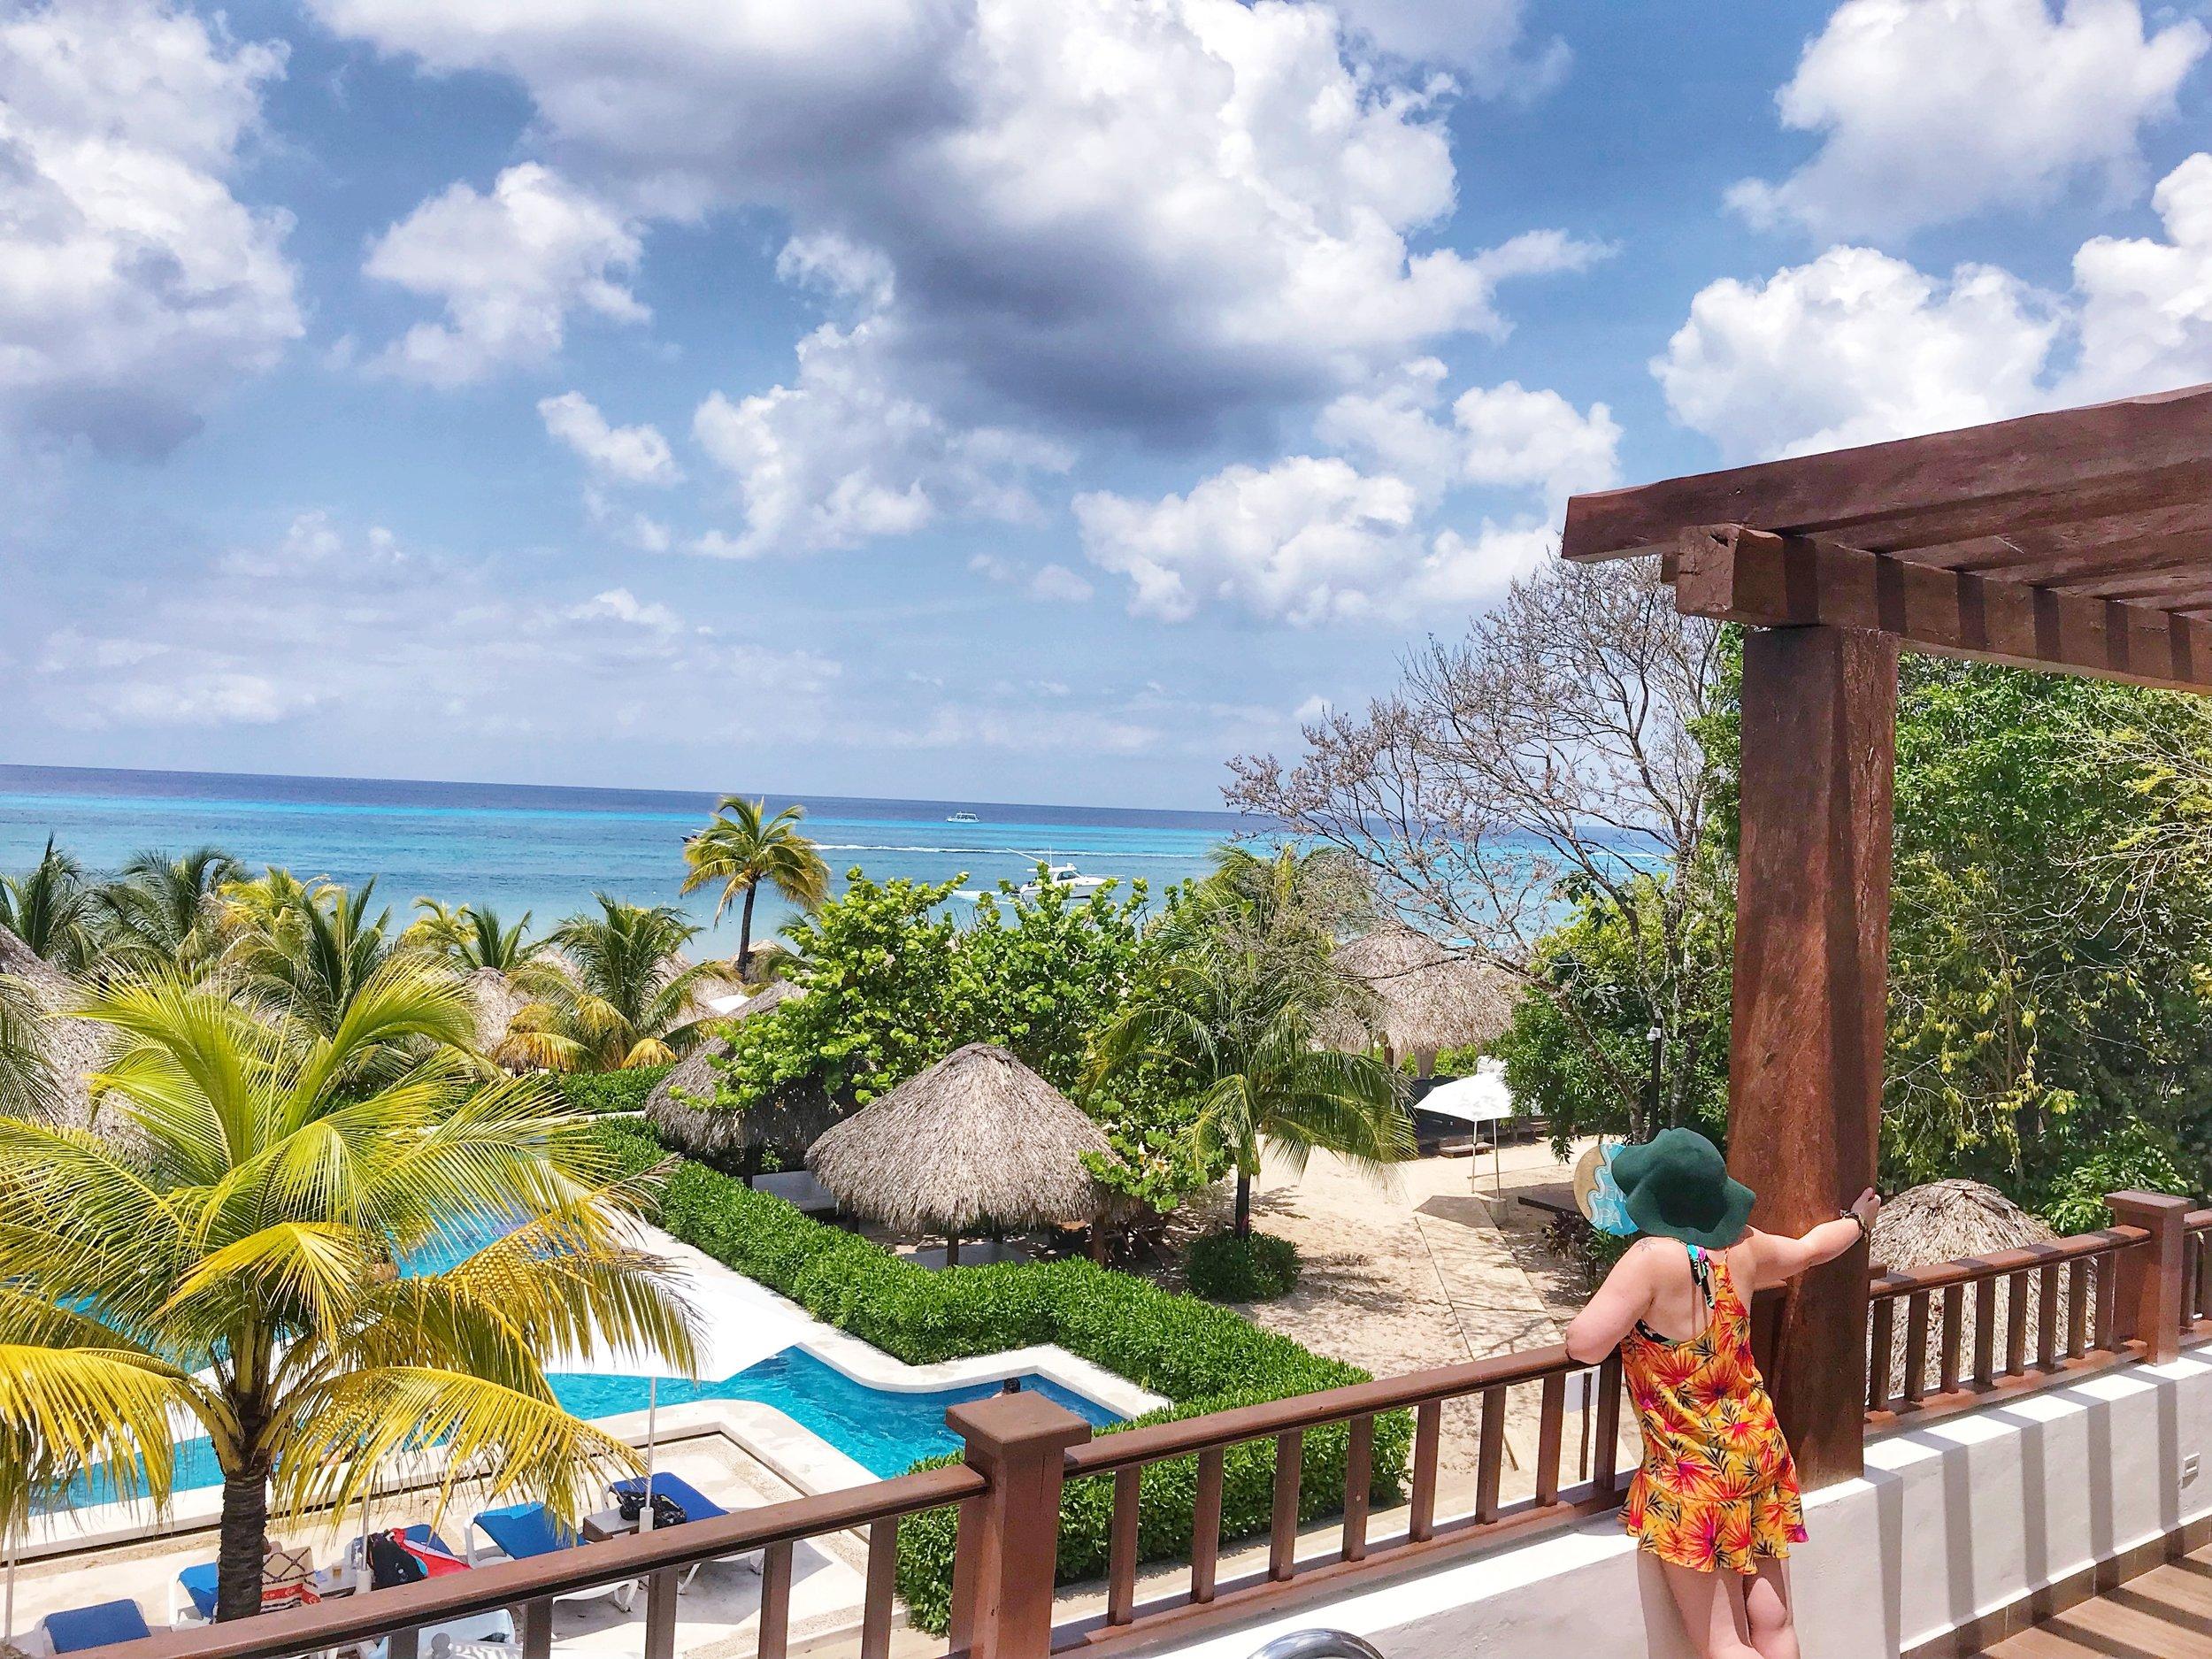 Mr. Sanchos Beach Club Cozumel Mexico